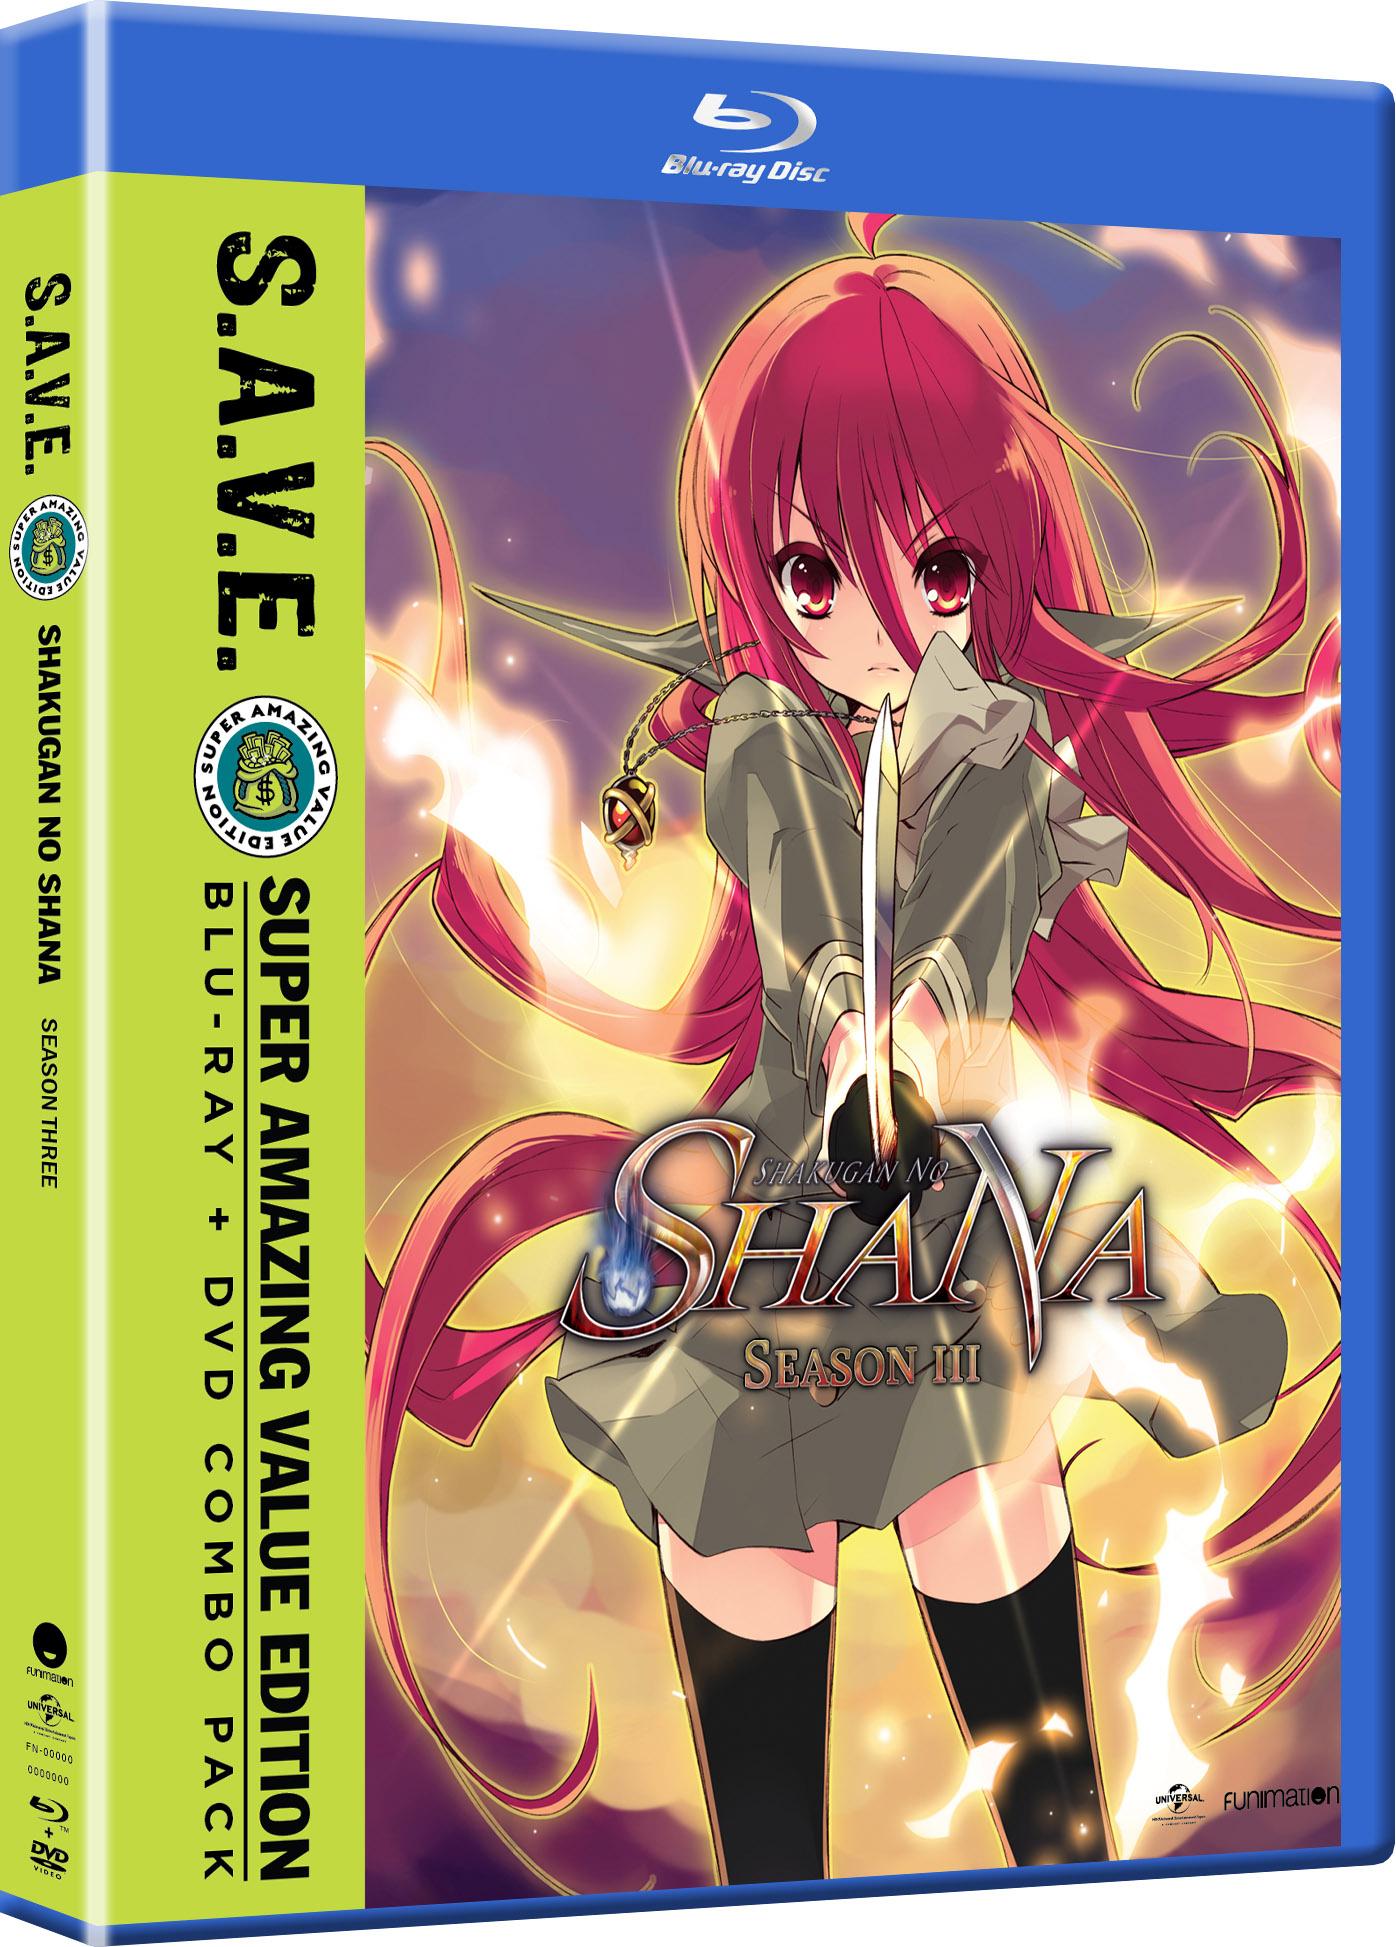 Shakugan no Shana Season 3 Blu-ray/DVD SAVE Edition